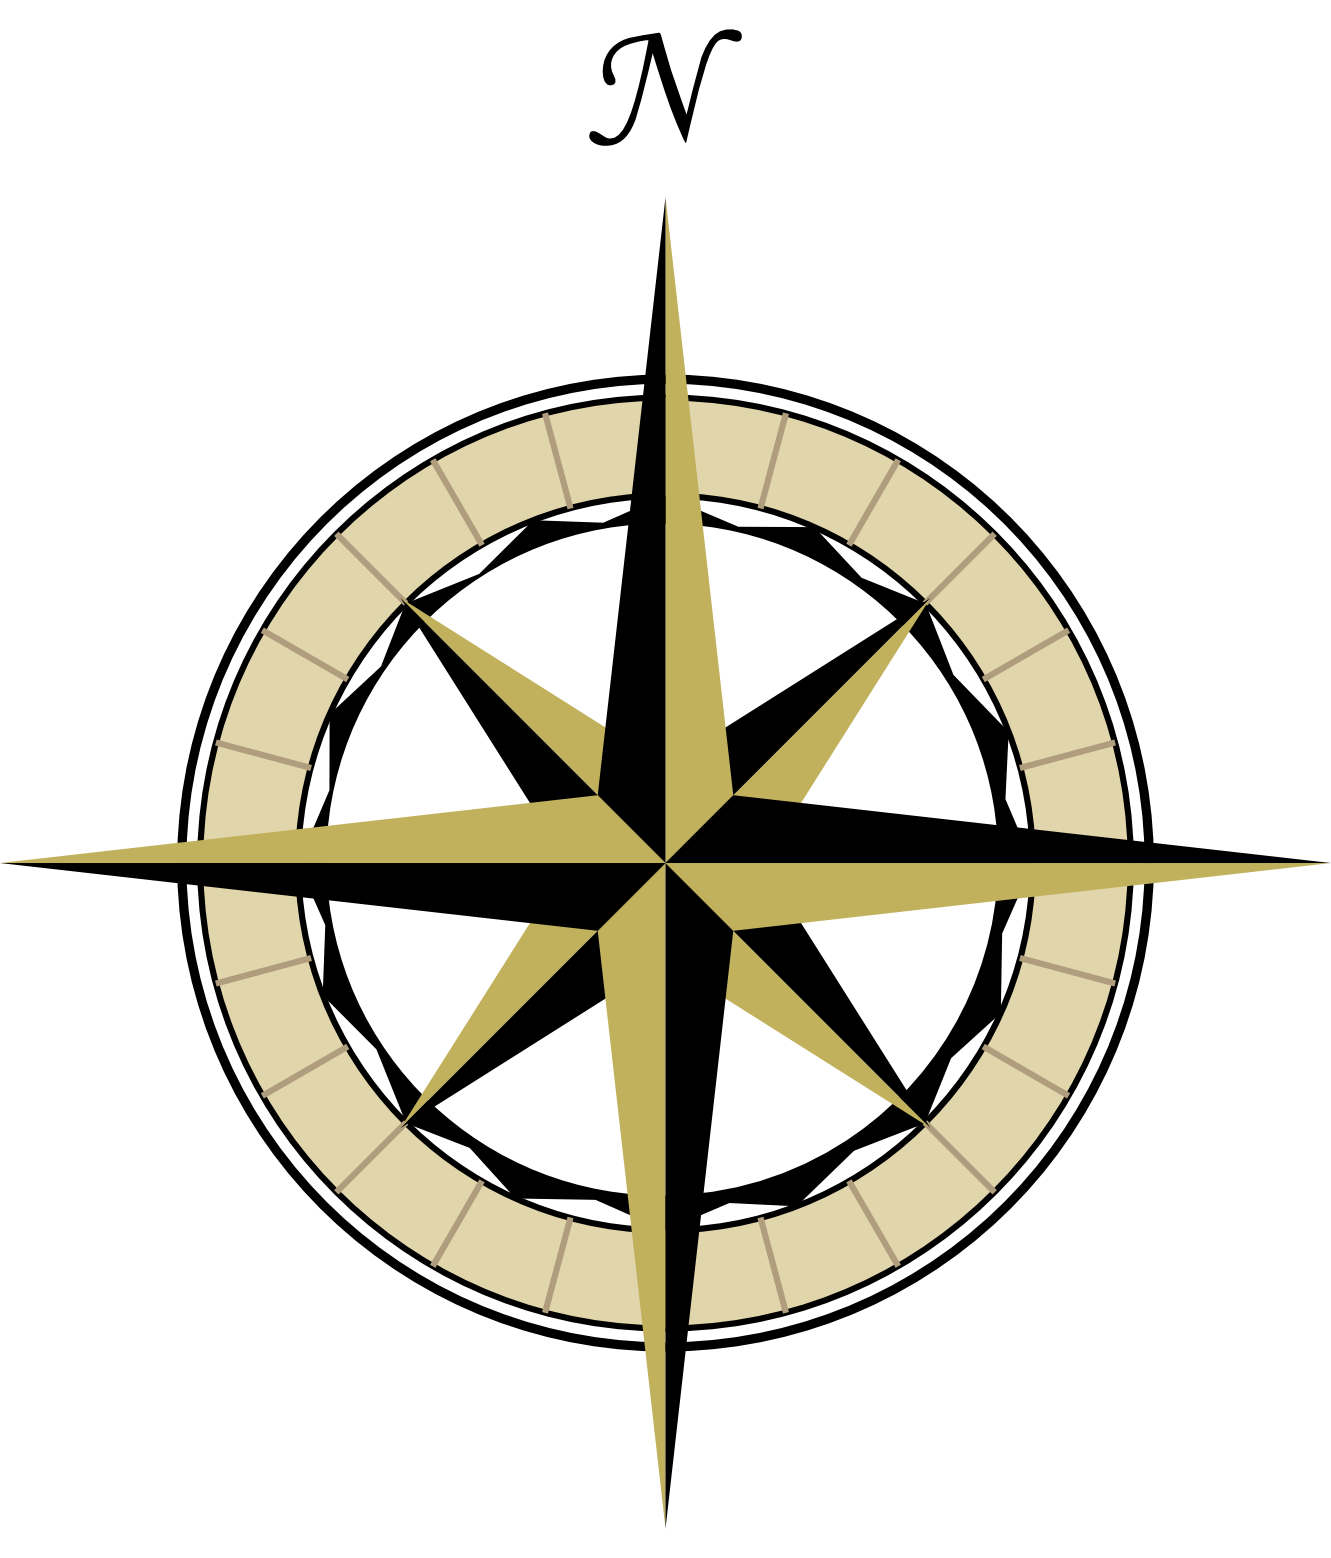 Compass Nautical Compass Tattoo Compass Tattoo Map Compass